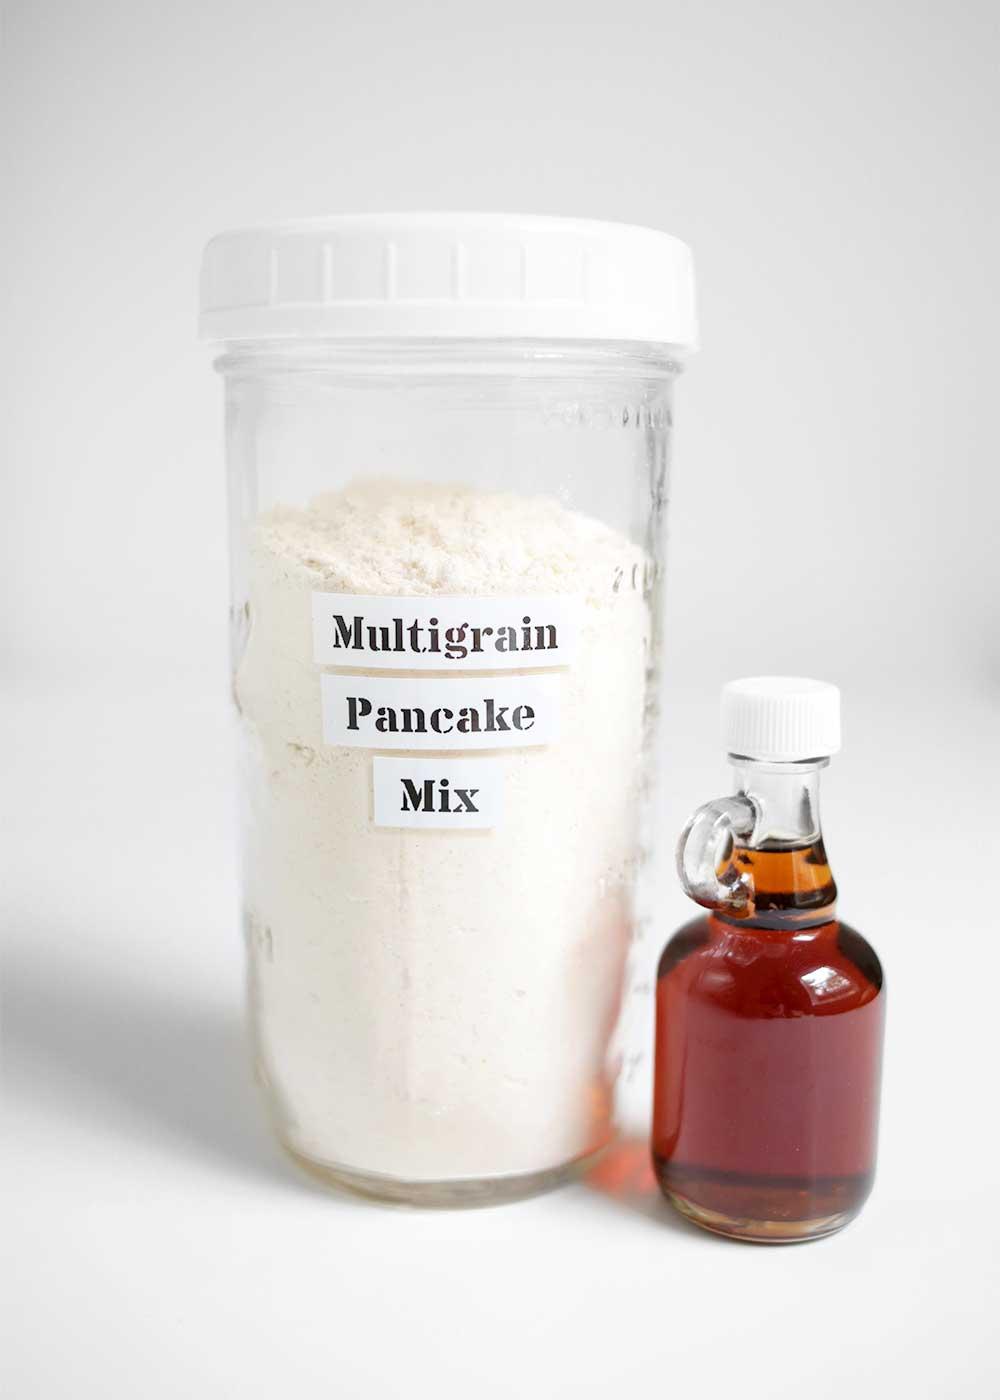 Multigrain Pancake Mix from the faux martha